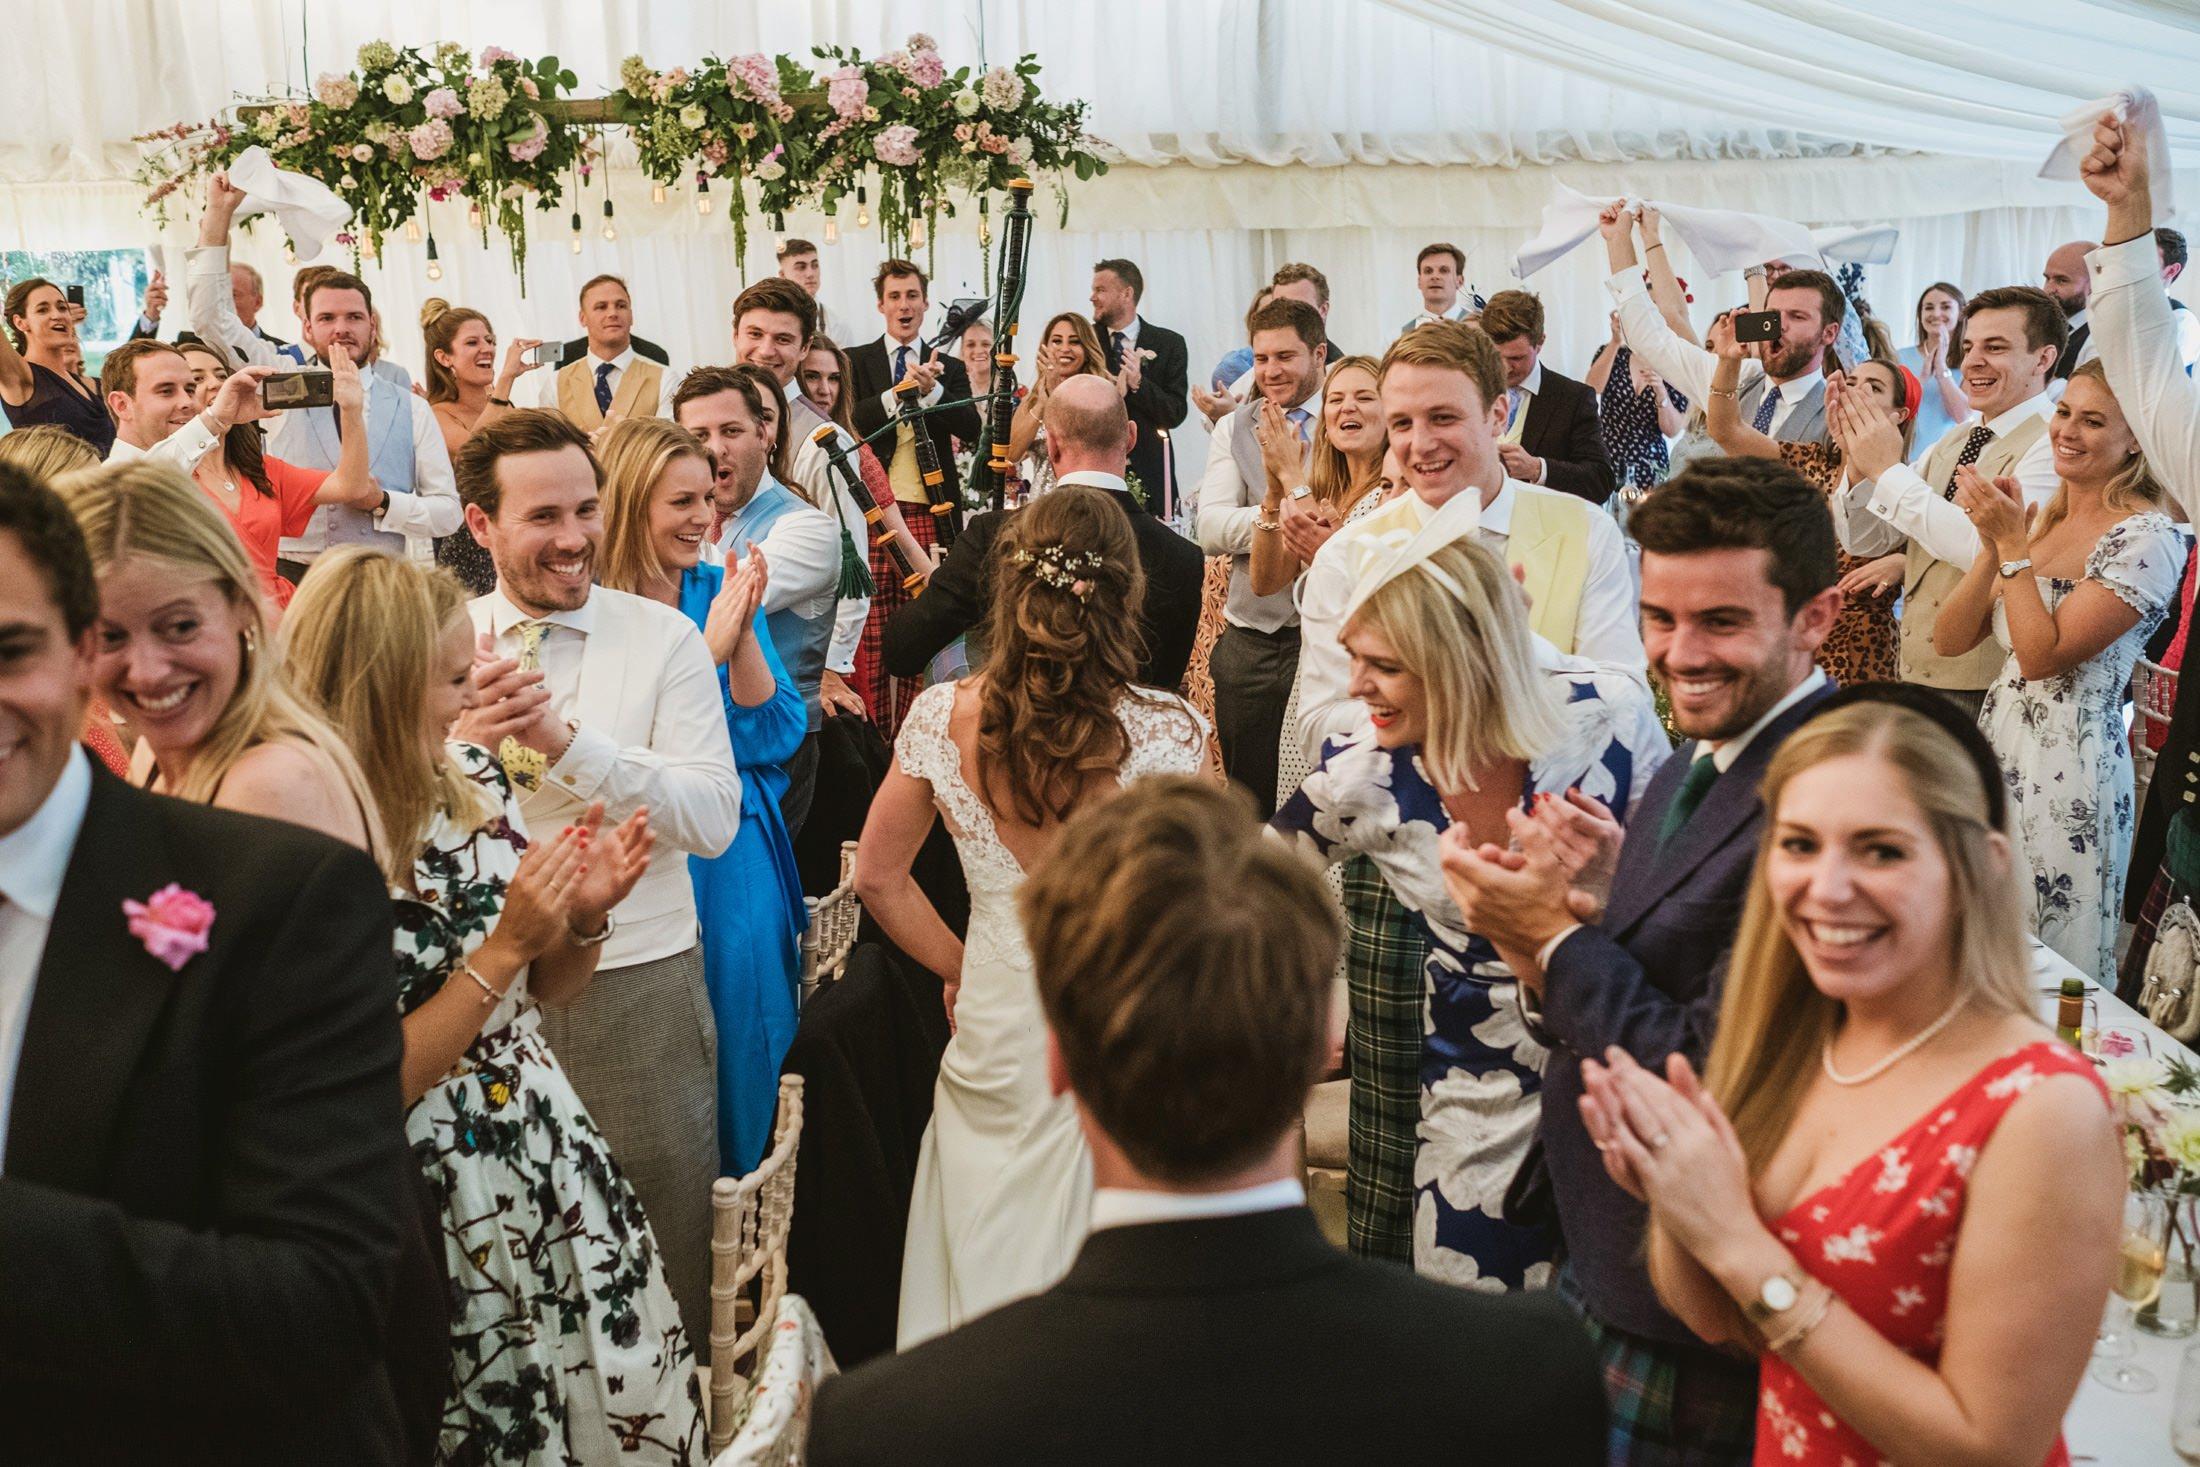 bride and groom wedding entrance, wedding guests all cheering